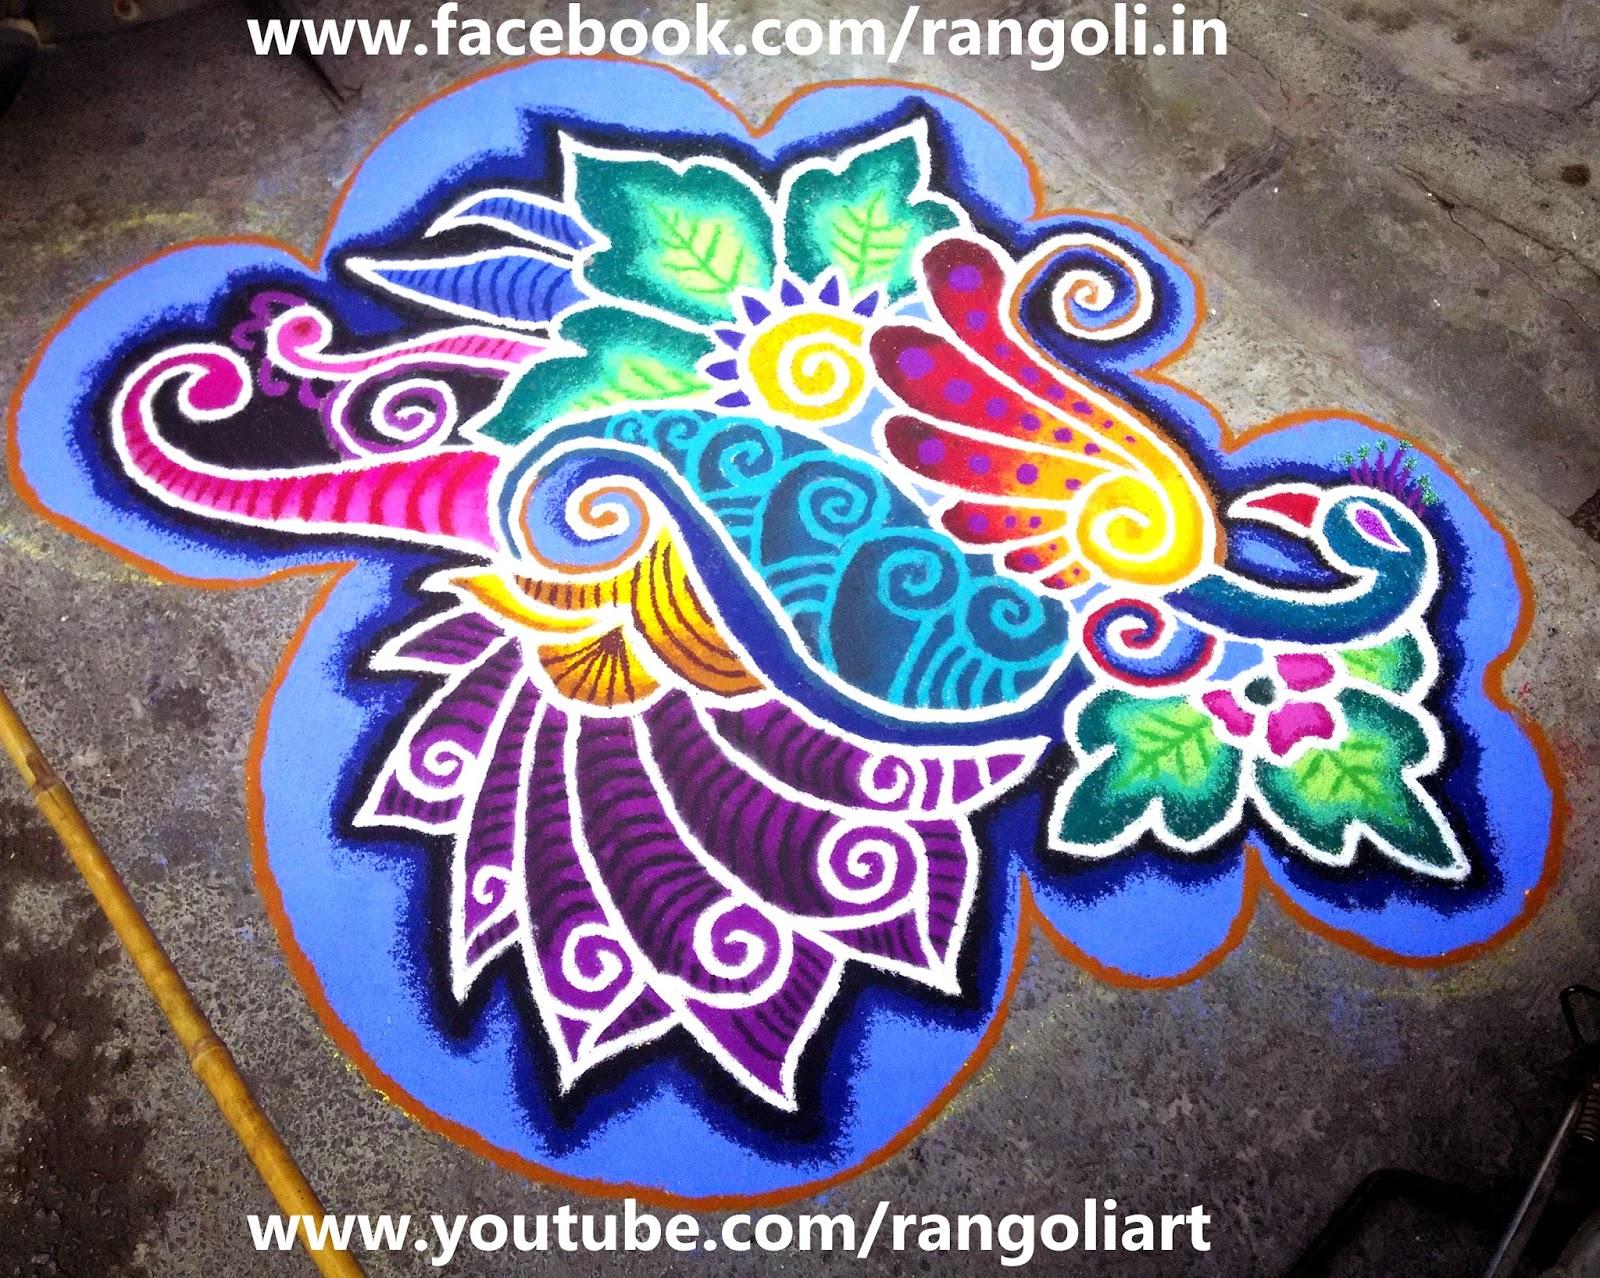 Happy Diwali Wallpaper 3d 2015 Diwali Rangoli Kolam Designs Images Peacock Rangoli